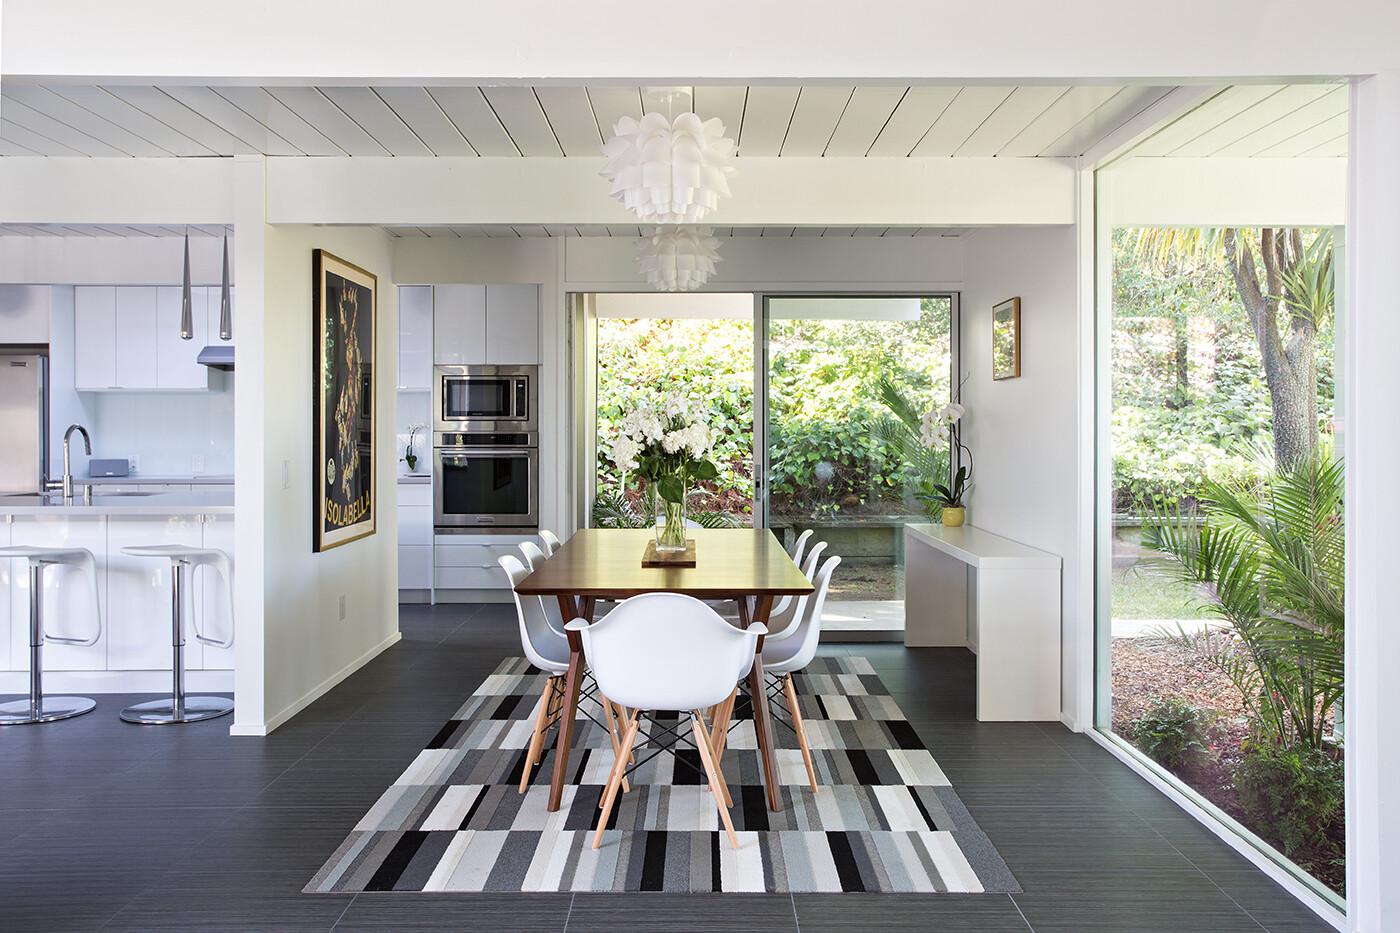 eichler house modernized by klopf architecture